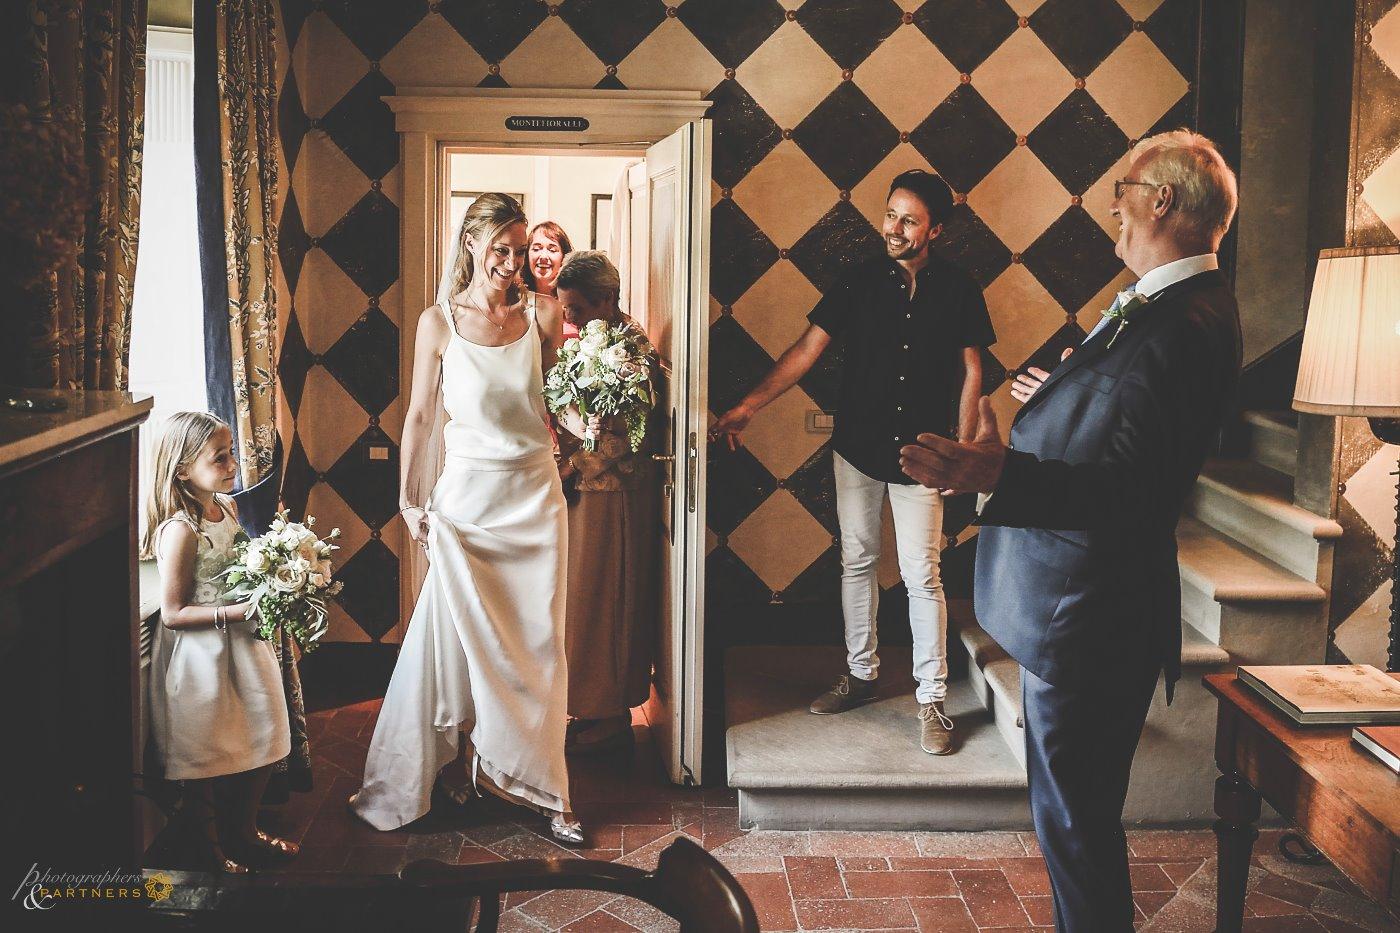 photography_weddings_villa_bordoni_04.jpg